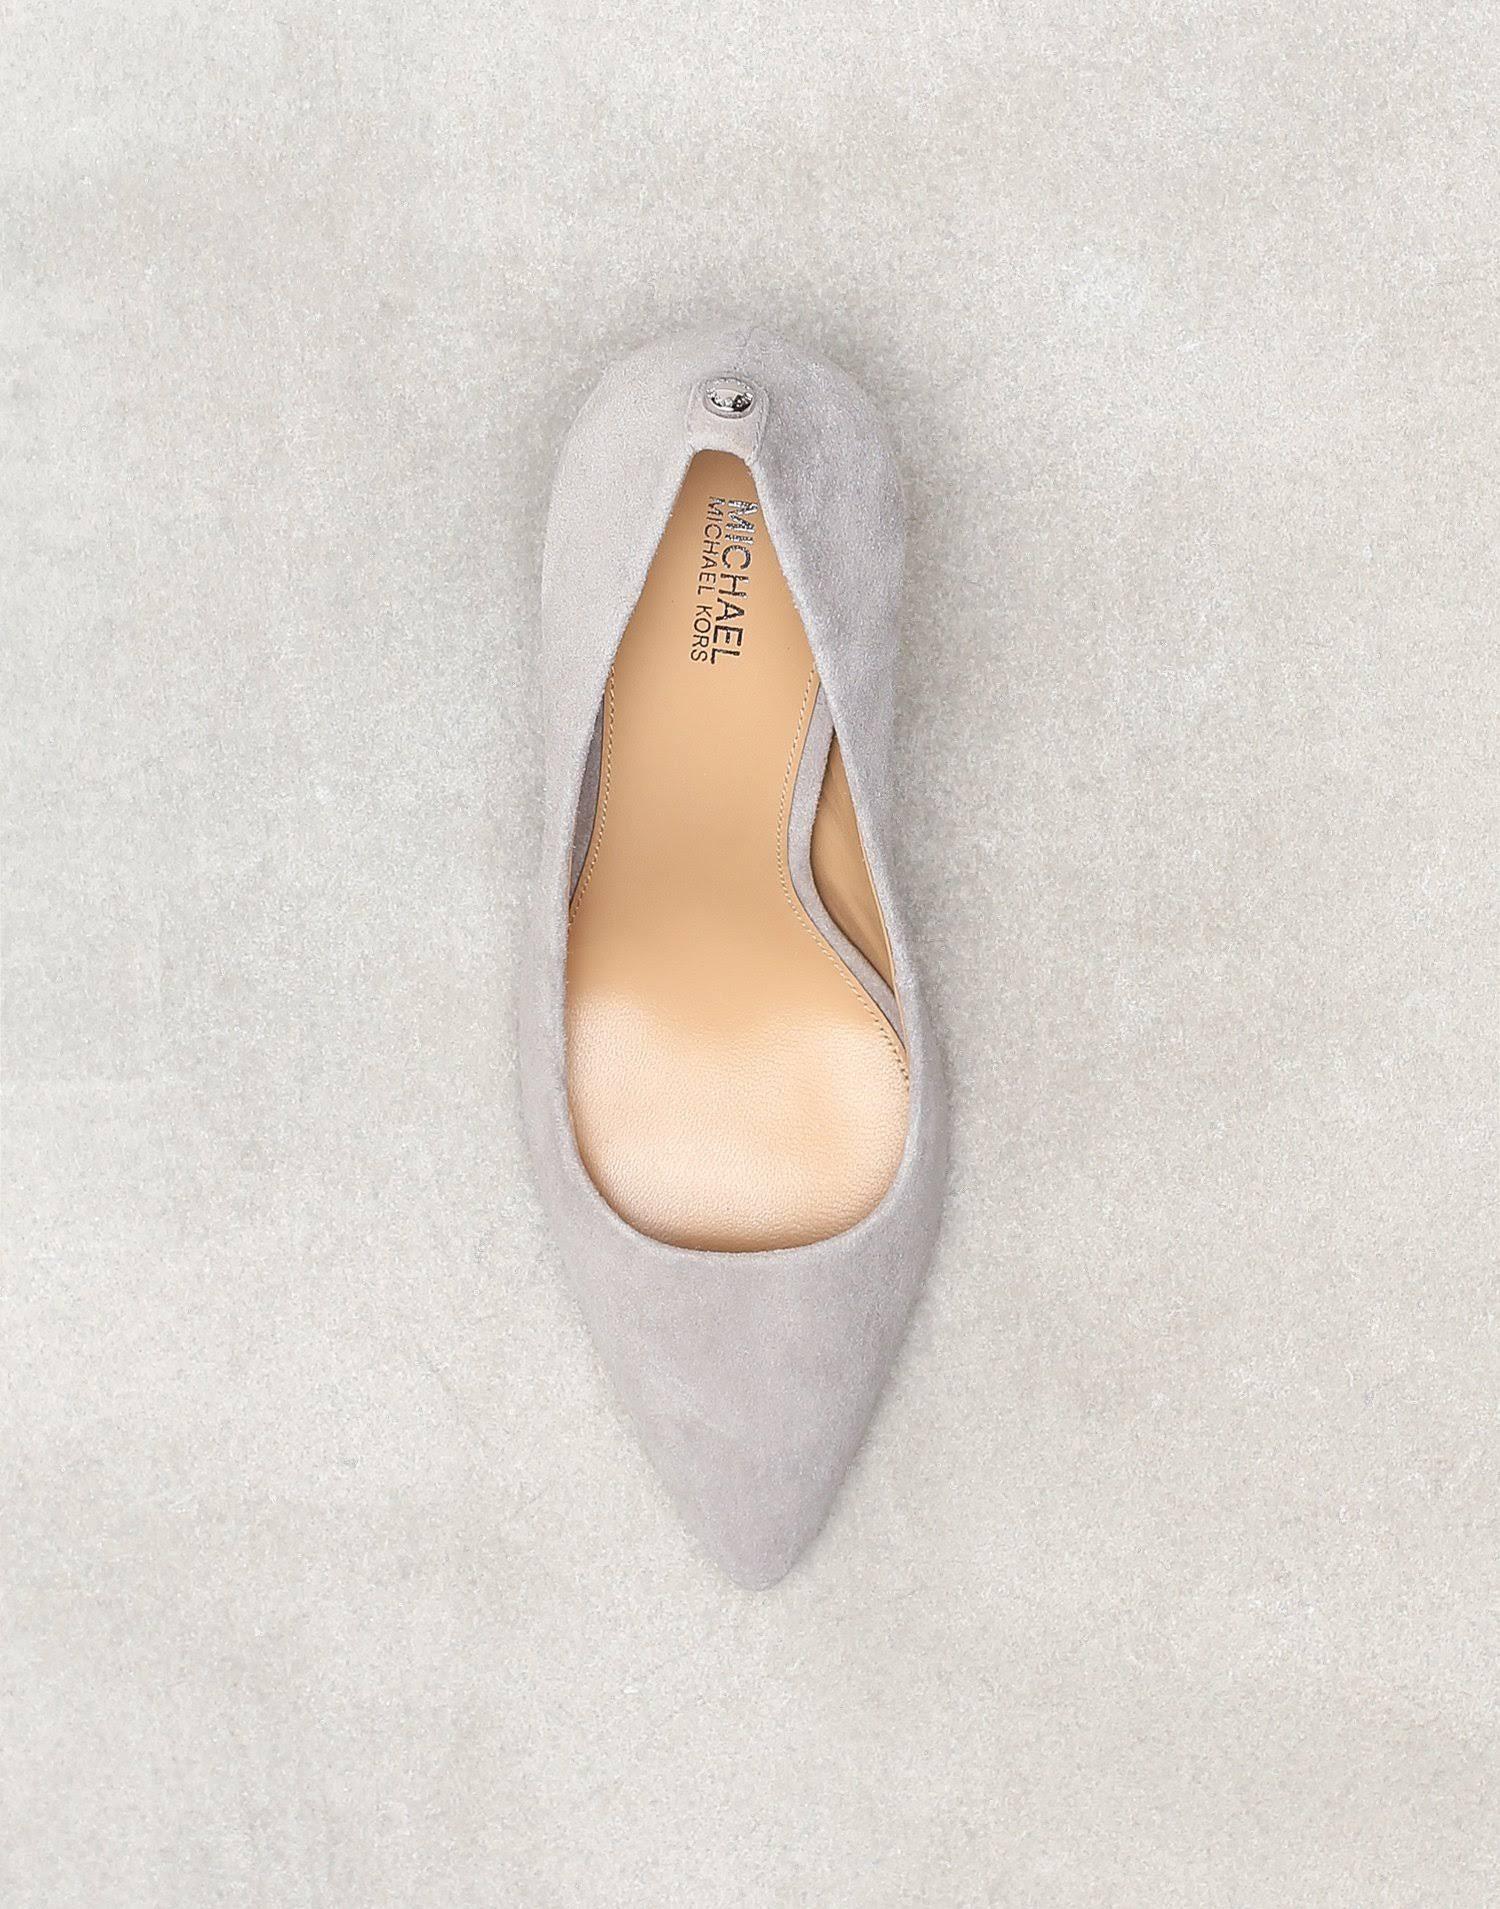 Michael Michael Kors Classic heels pearl grey, gender.adult.female, Size: 4, Light grey - Suede  Culs1R